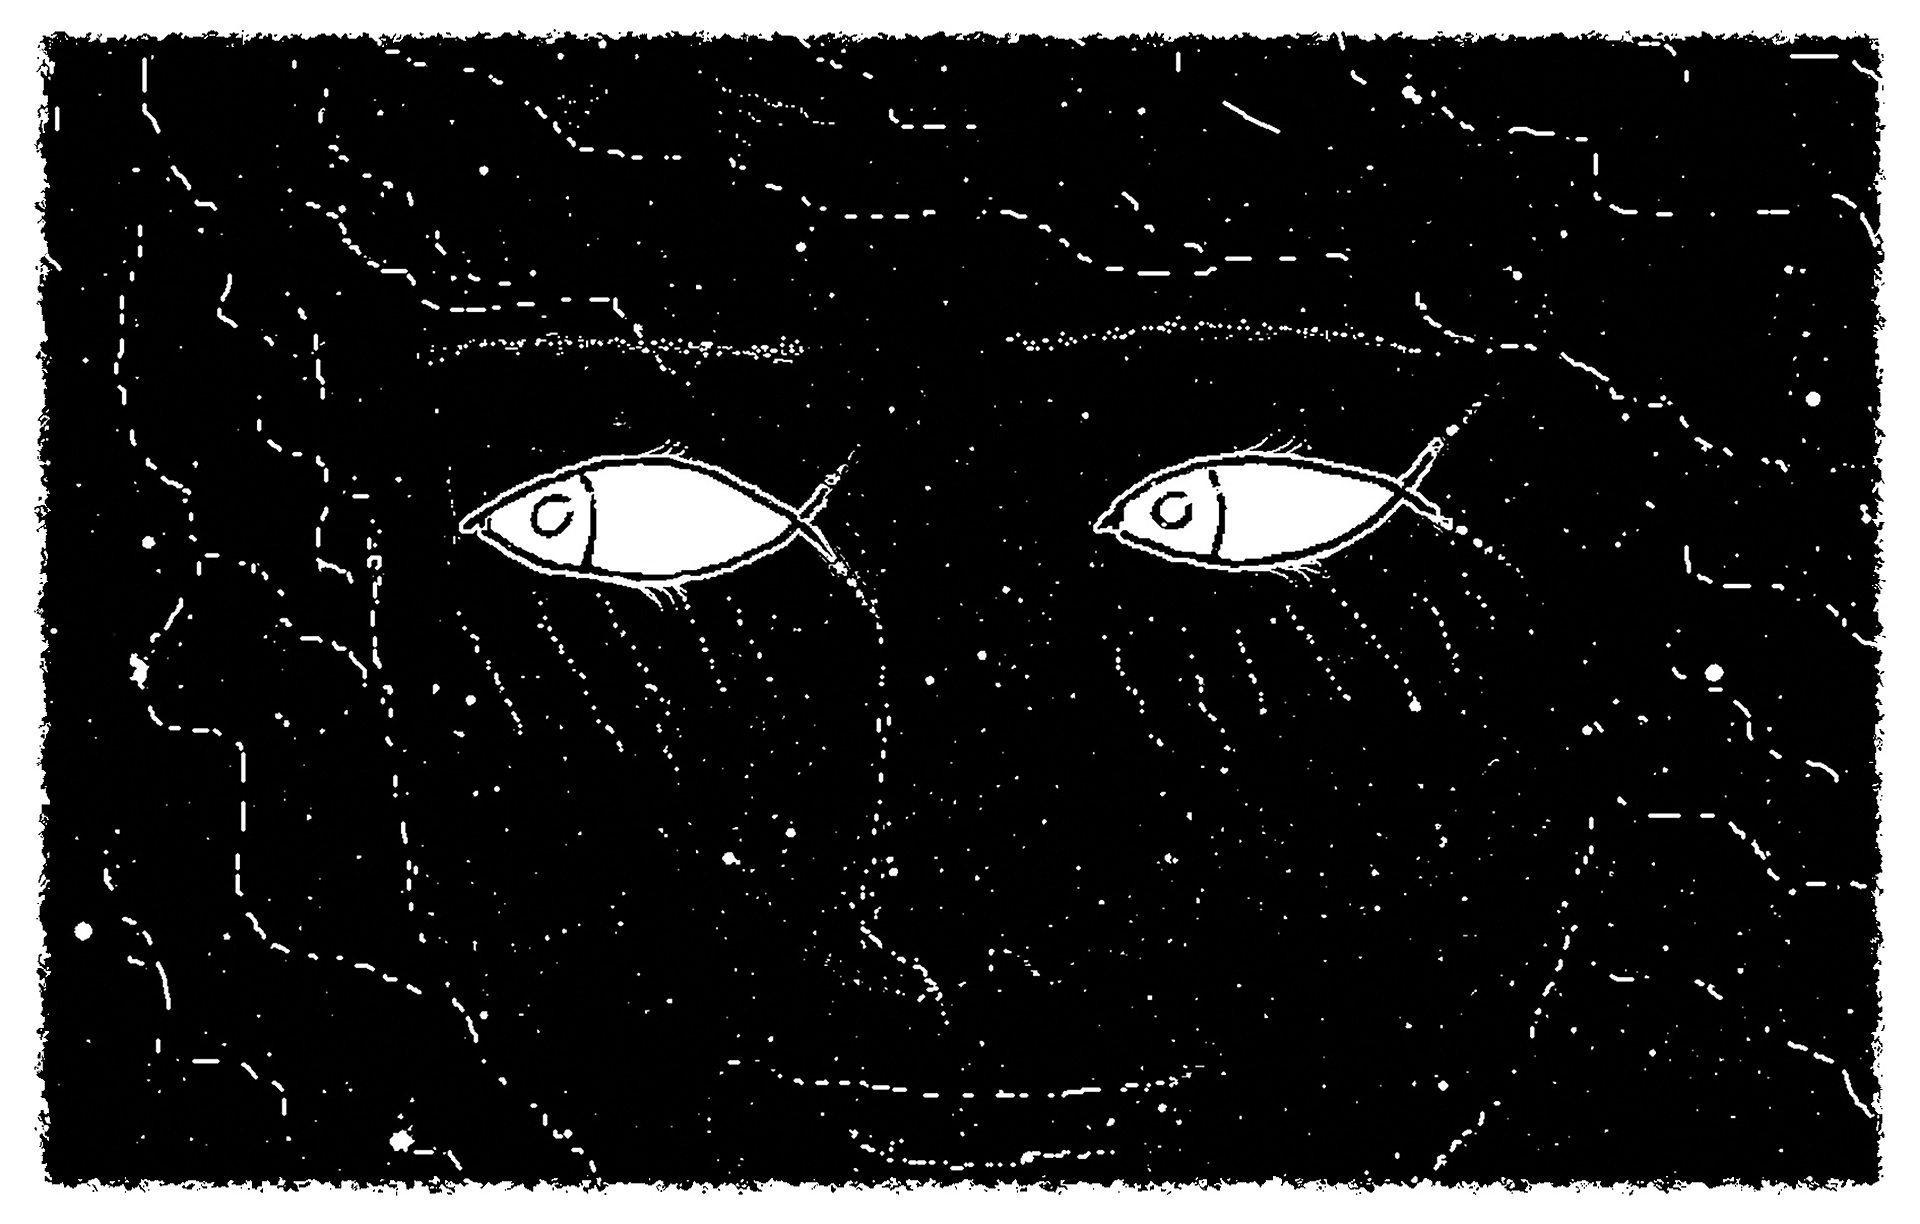 Image: Optical Illusion of a face